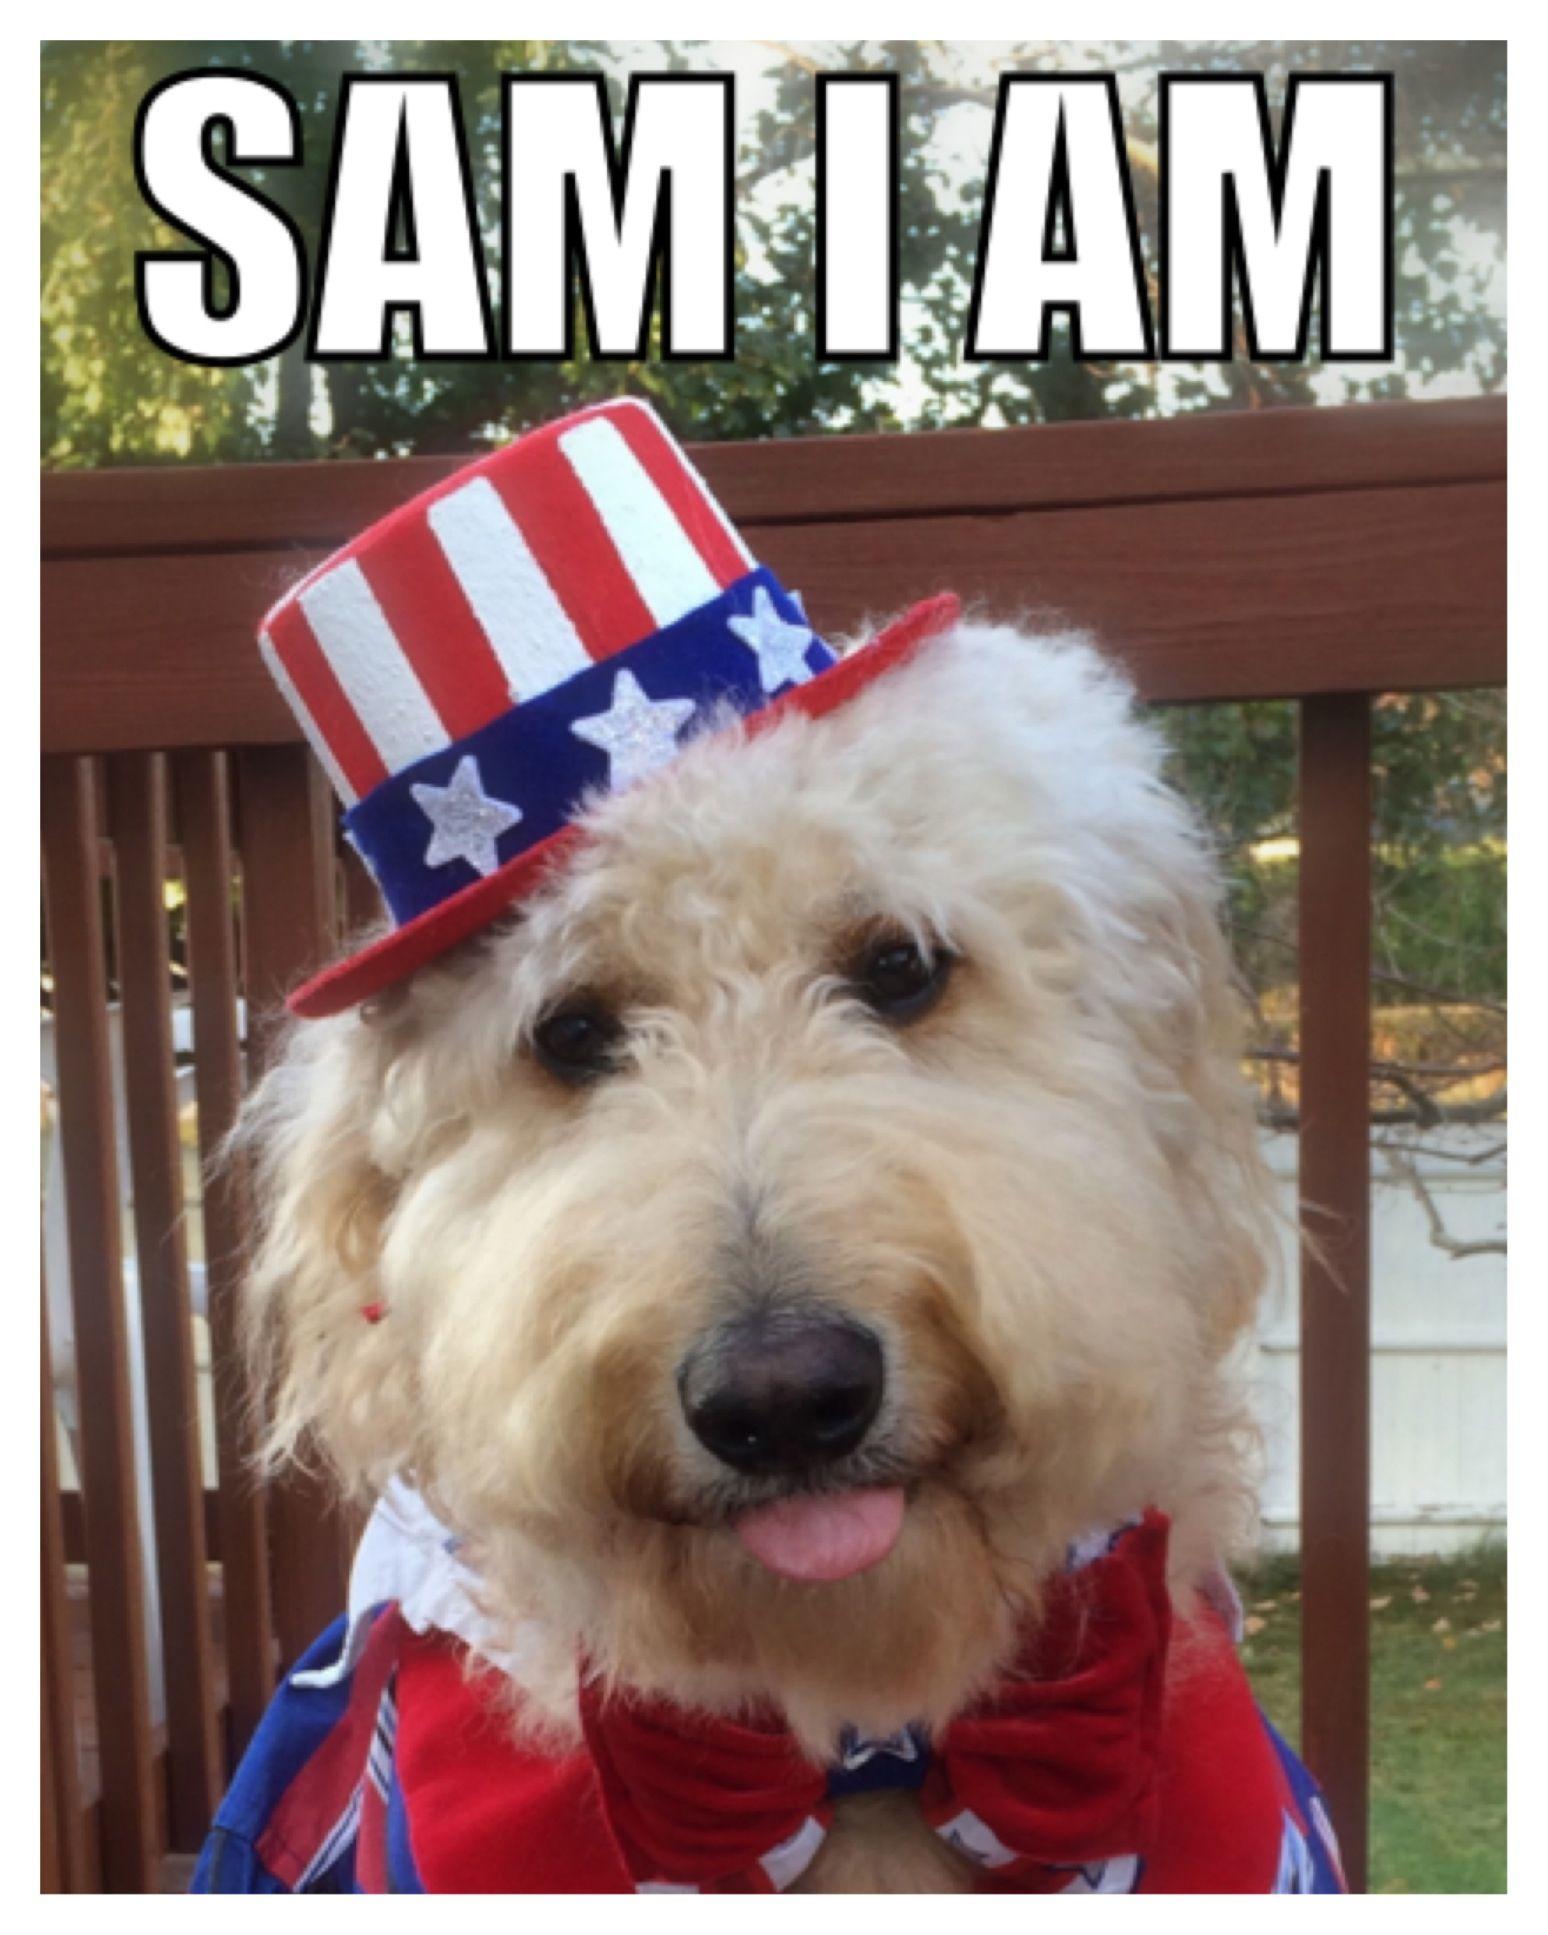 5407891263b My Yankee Doodle Dandy. hahaha   D  Uncle Sam  Goldendoodle  Halloween   costume  FourthofJuly  tongue  patriotic  stars  stripes  redwhiteandblue   dog  pets ...